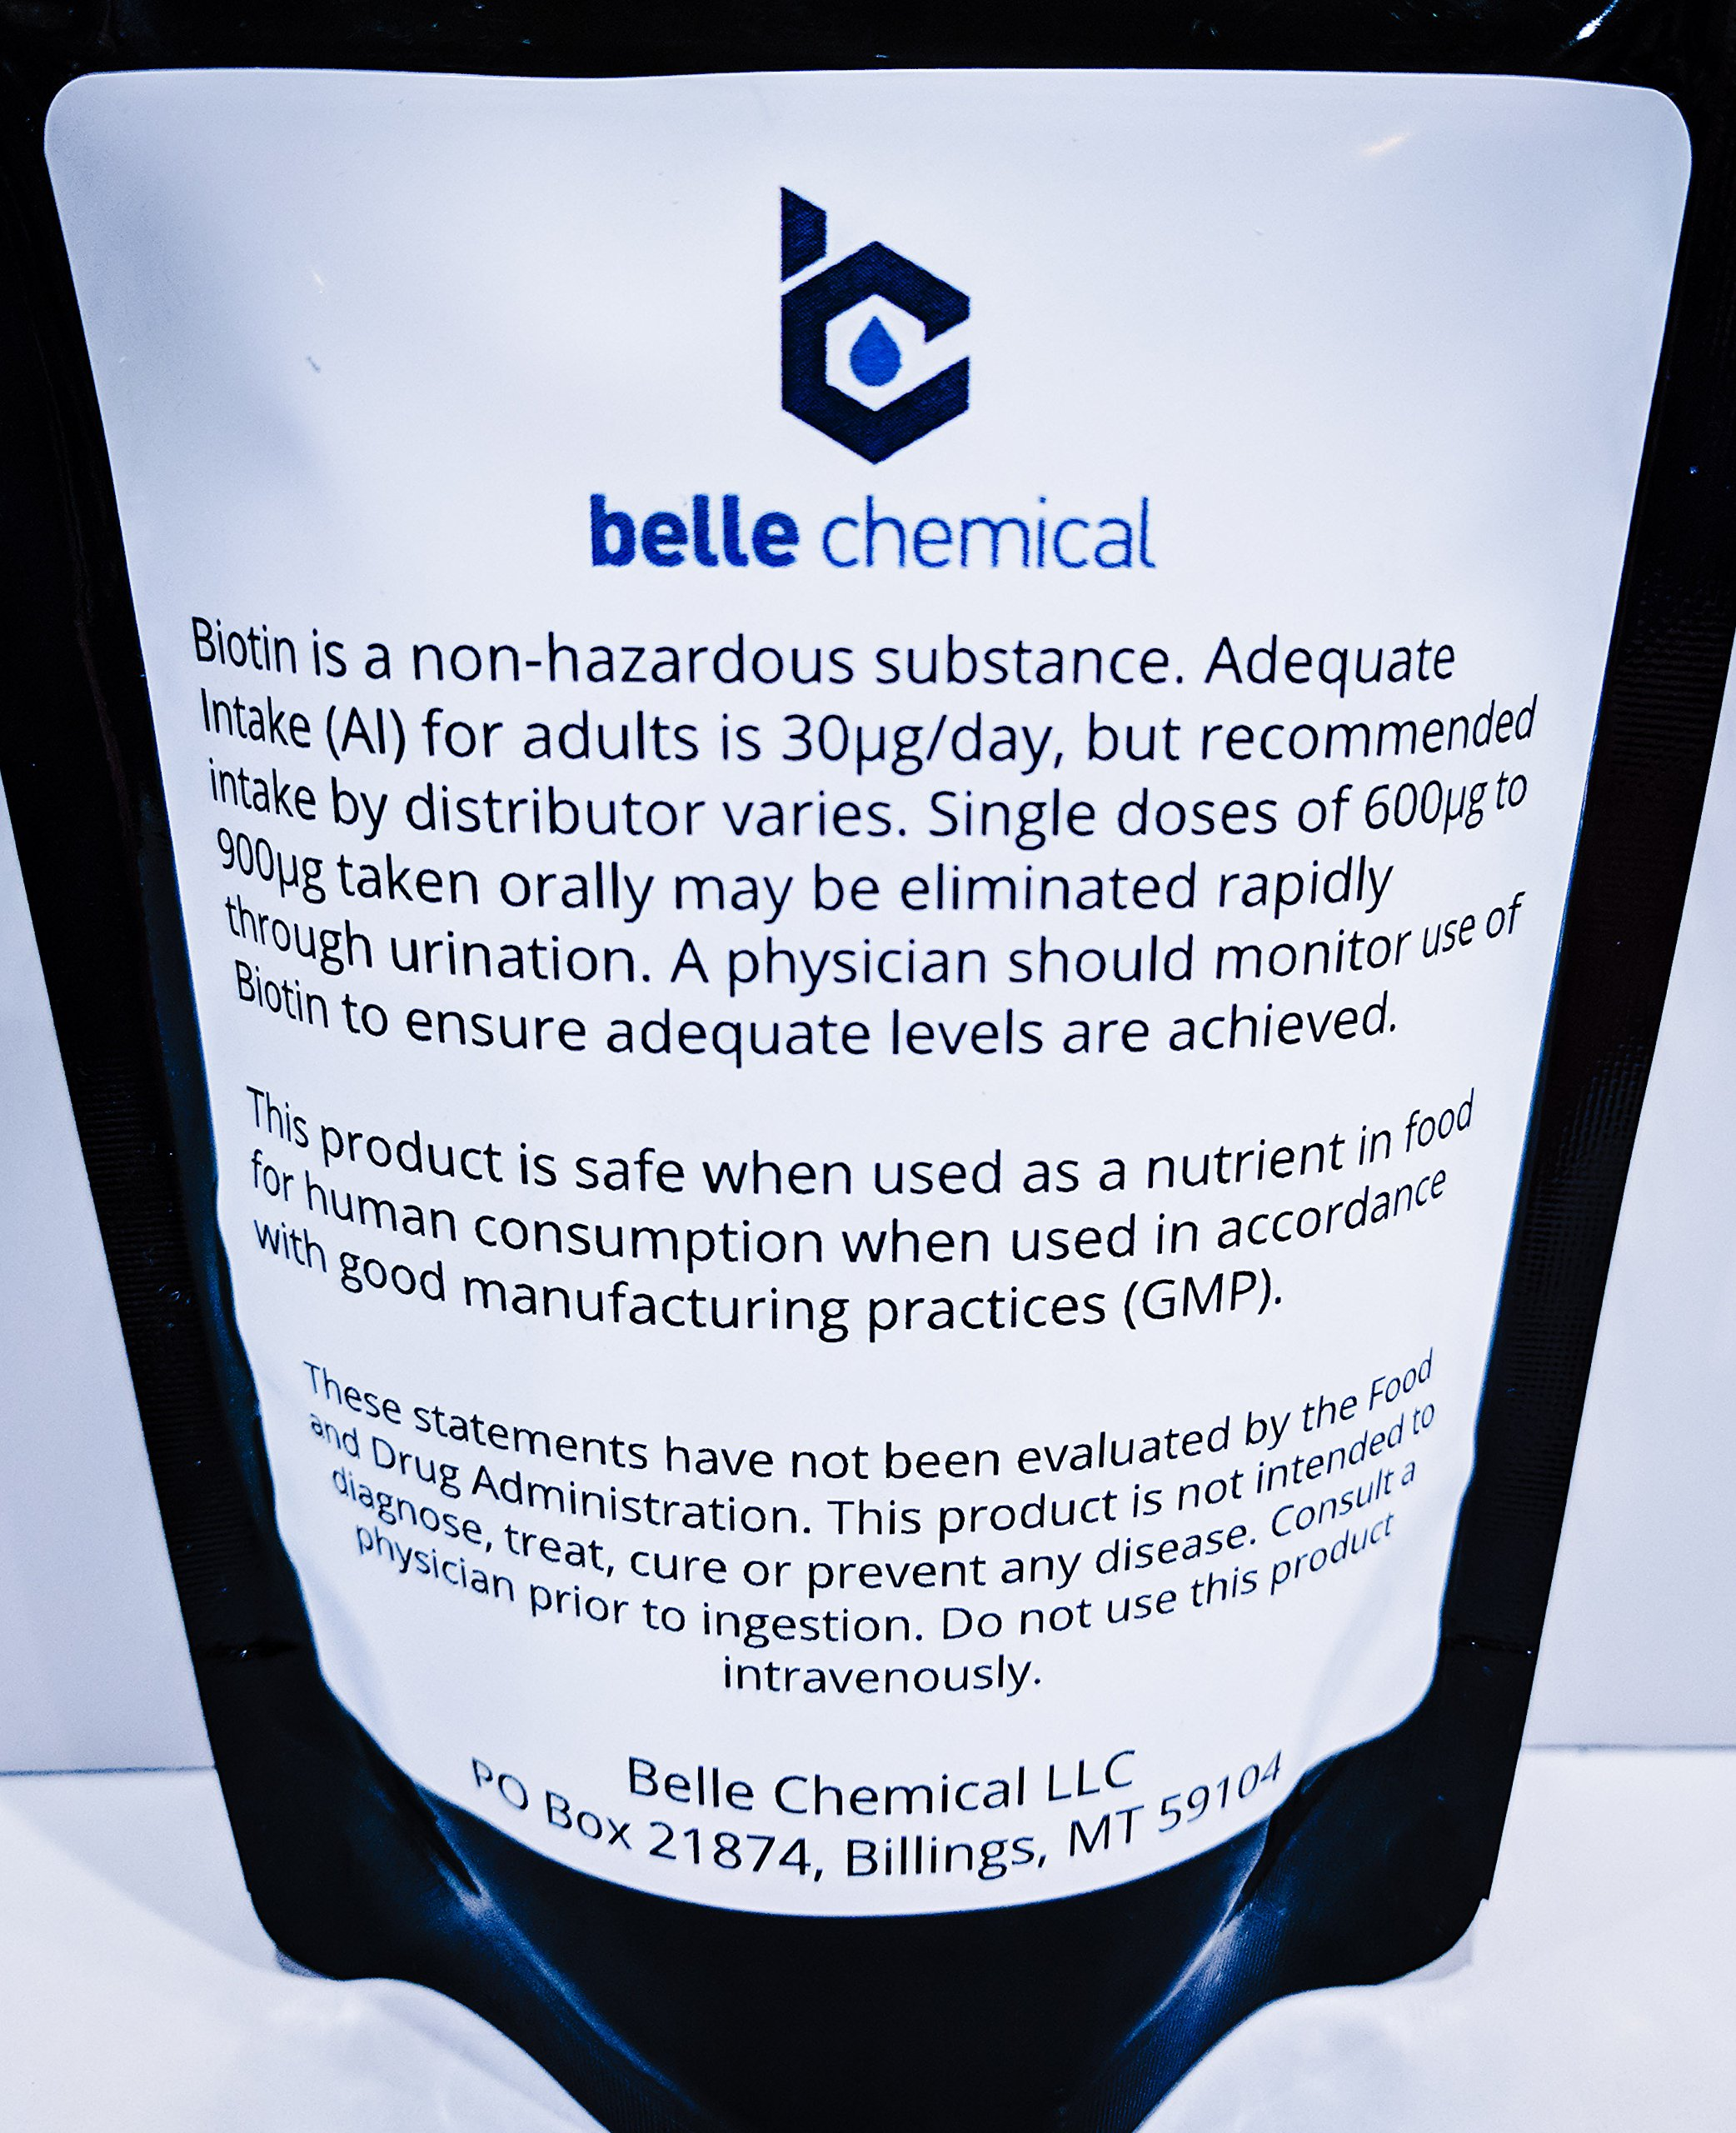 Biotin (Vitamin B7) Pure Powder 4oz (113g) Hair, Nails, Metabolism, Cell Growth by Belle Chemical